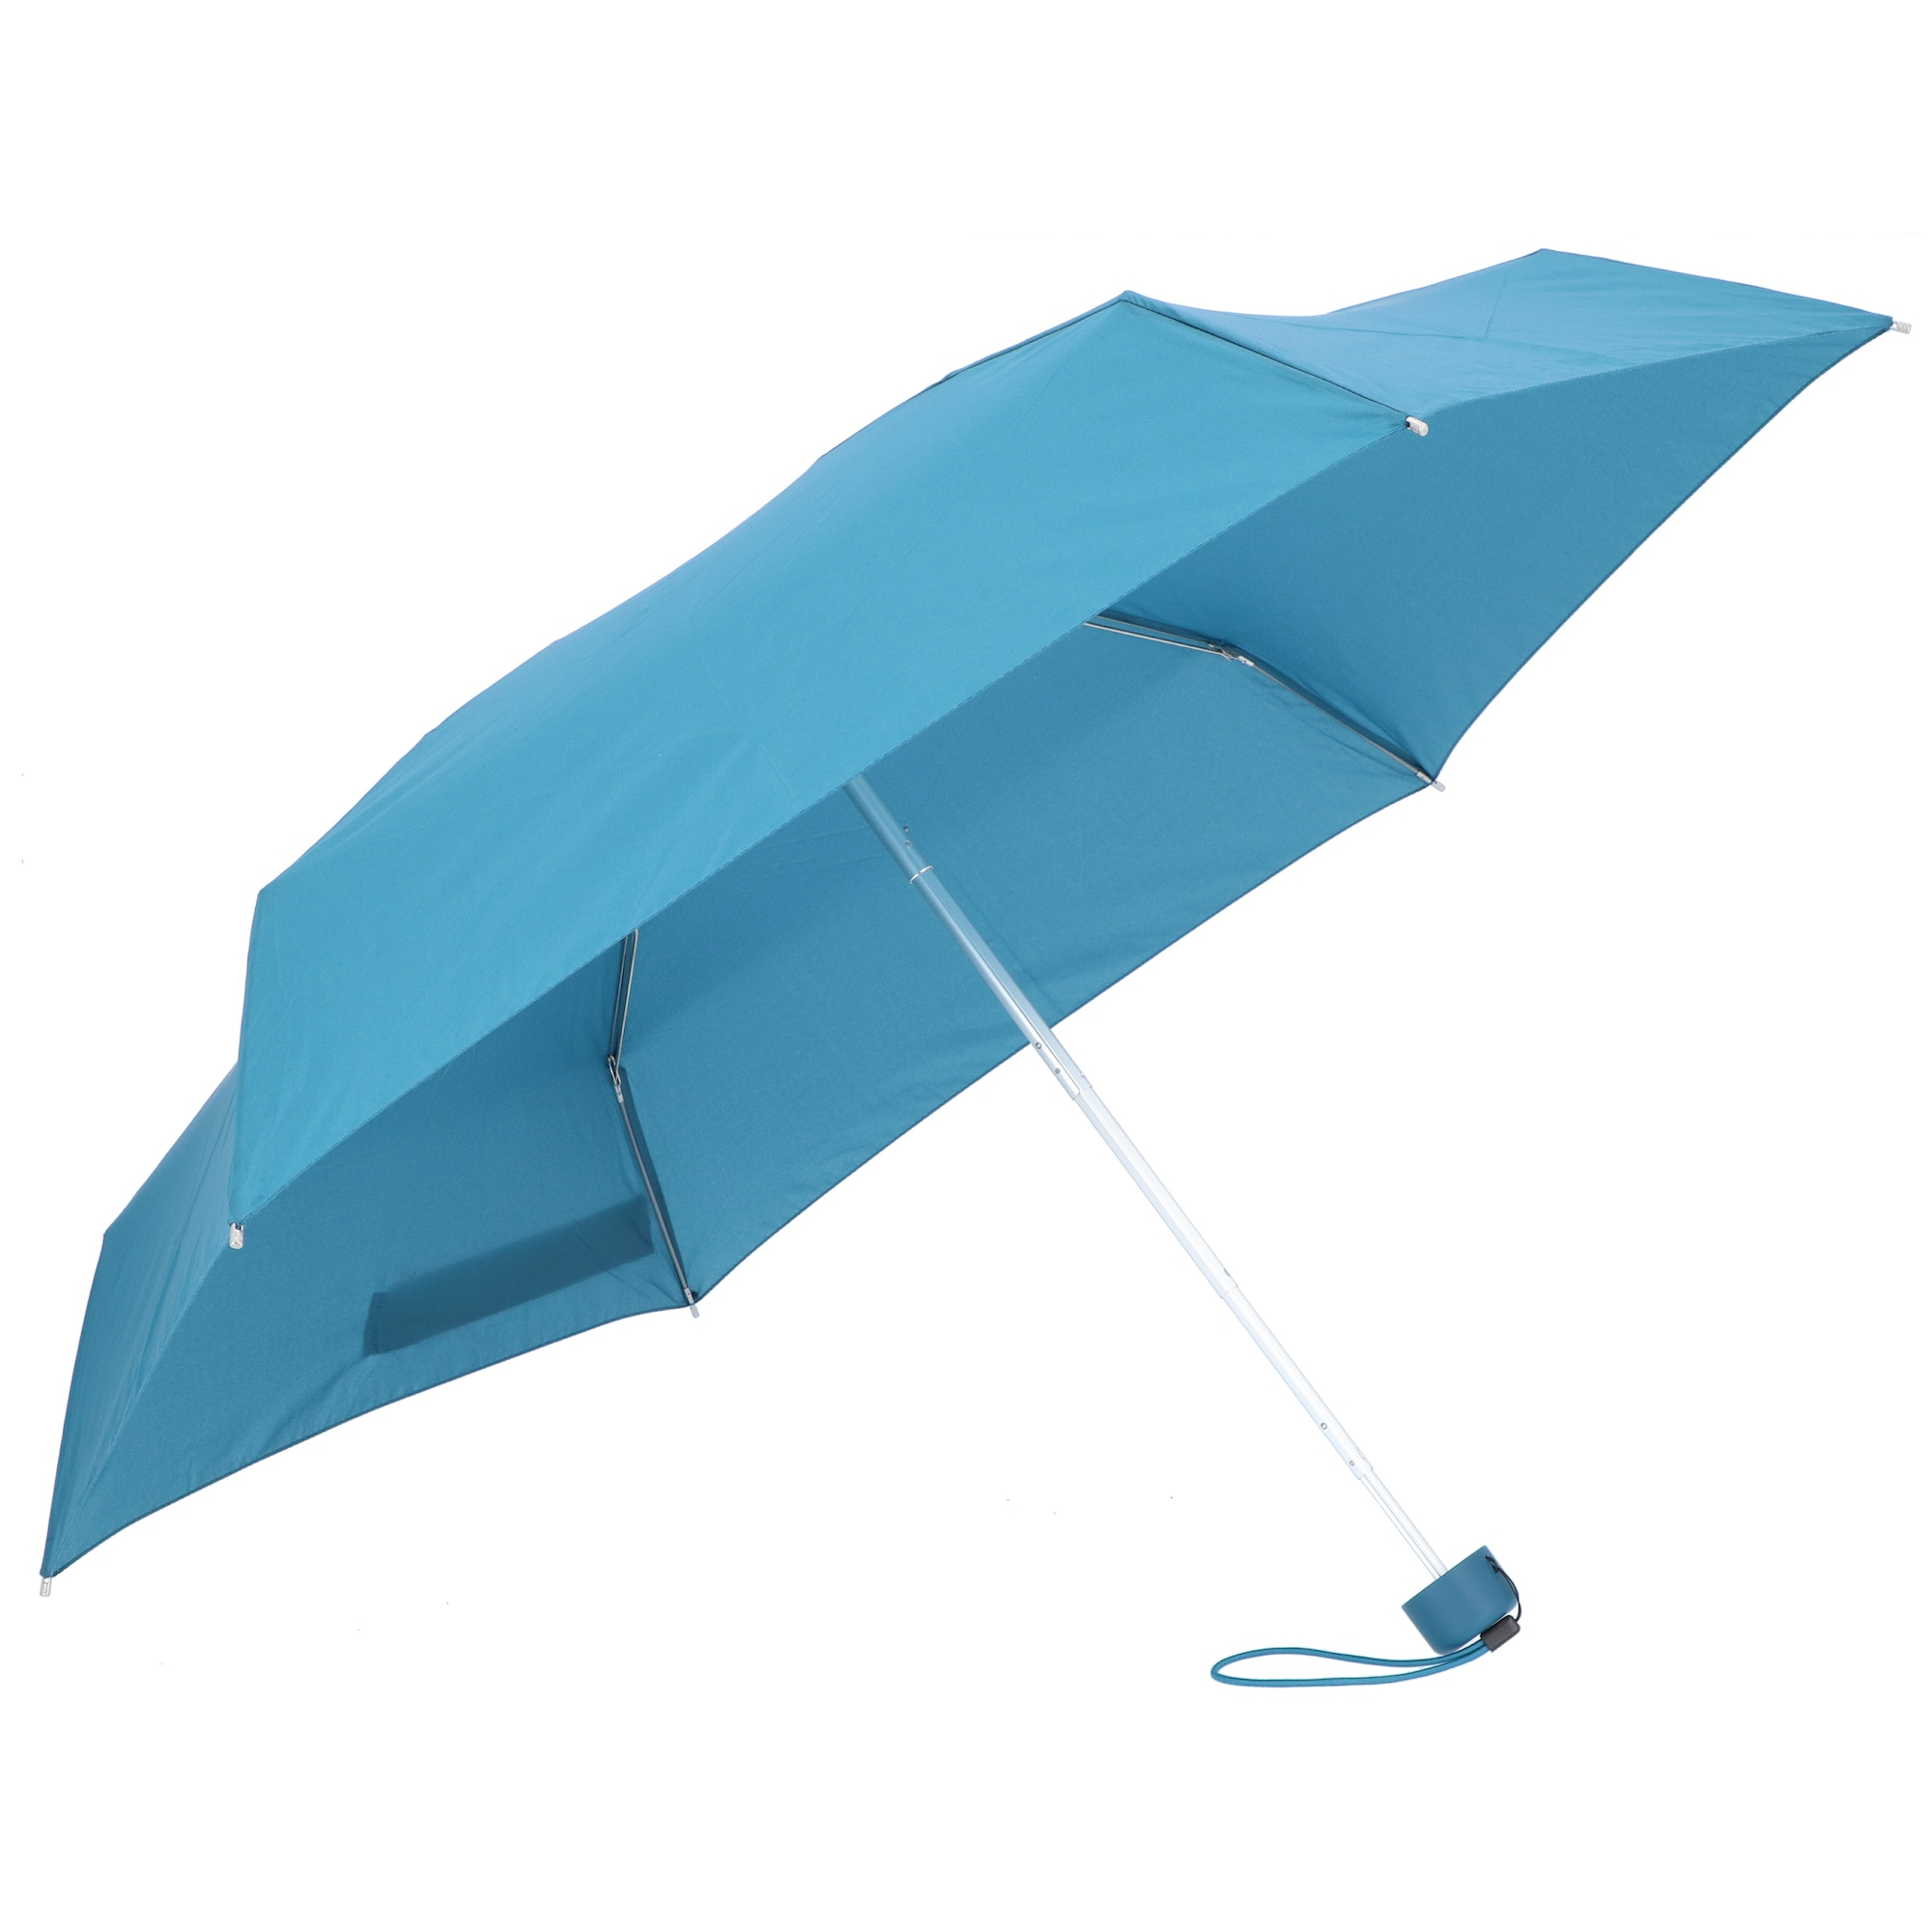 Taschenschirm 'Minipli Colori S' | Accessoires > Regenschirme > Taschenschirme | Hellblau | Samsonite